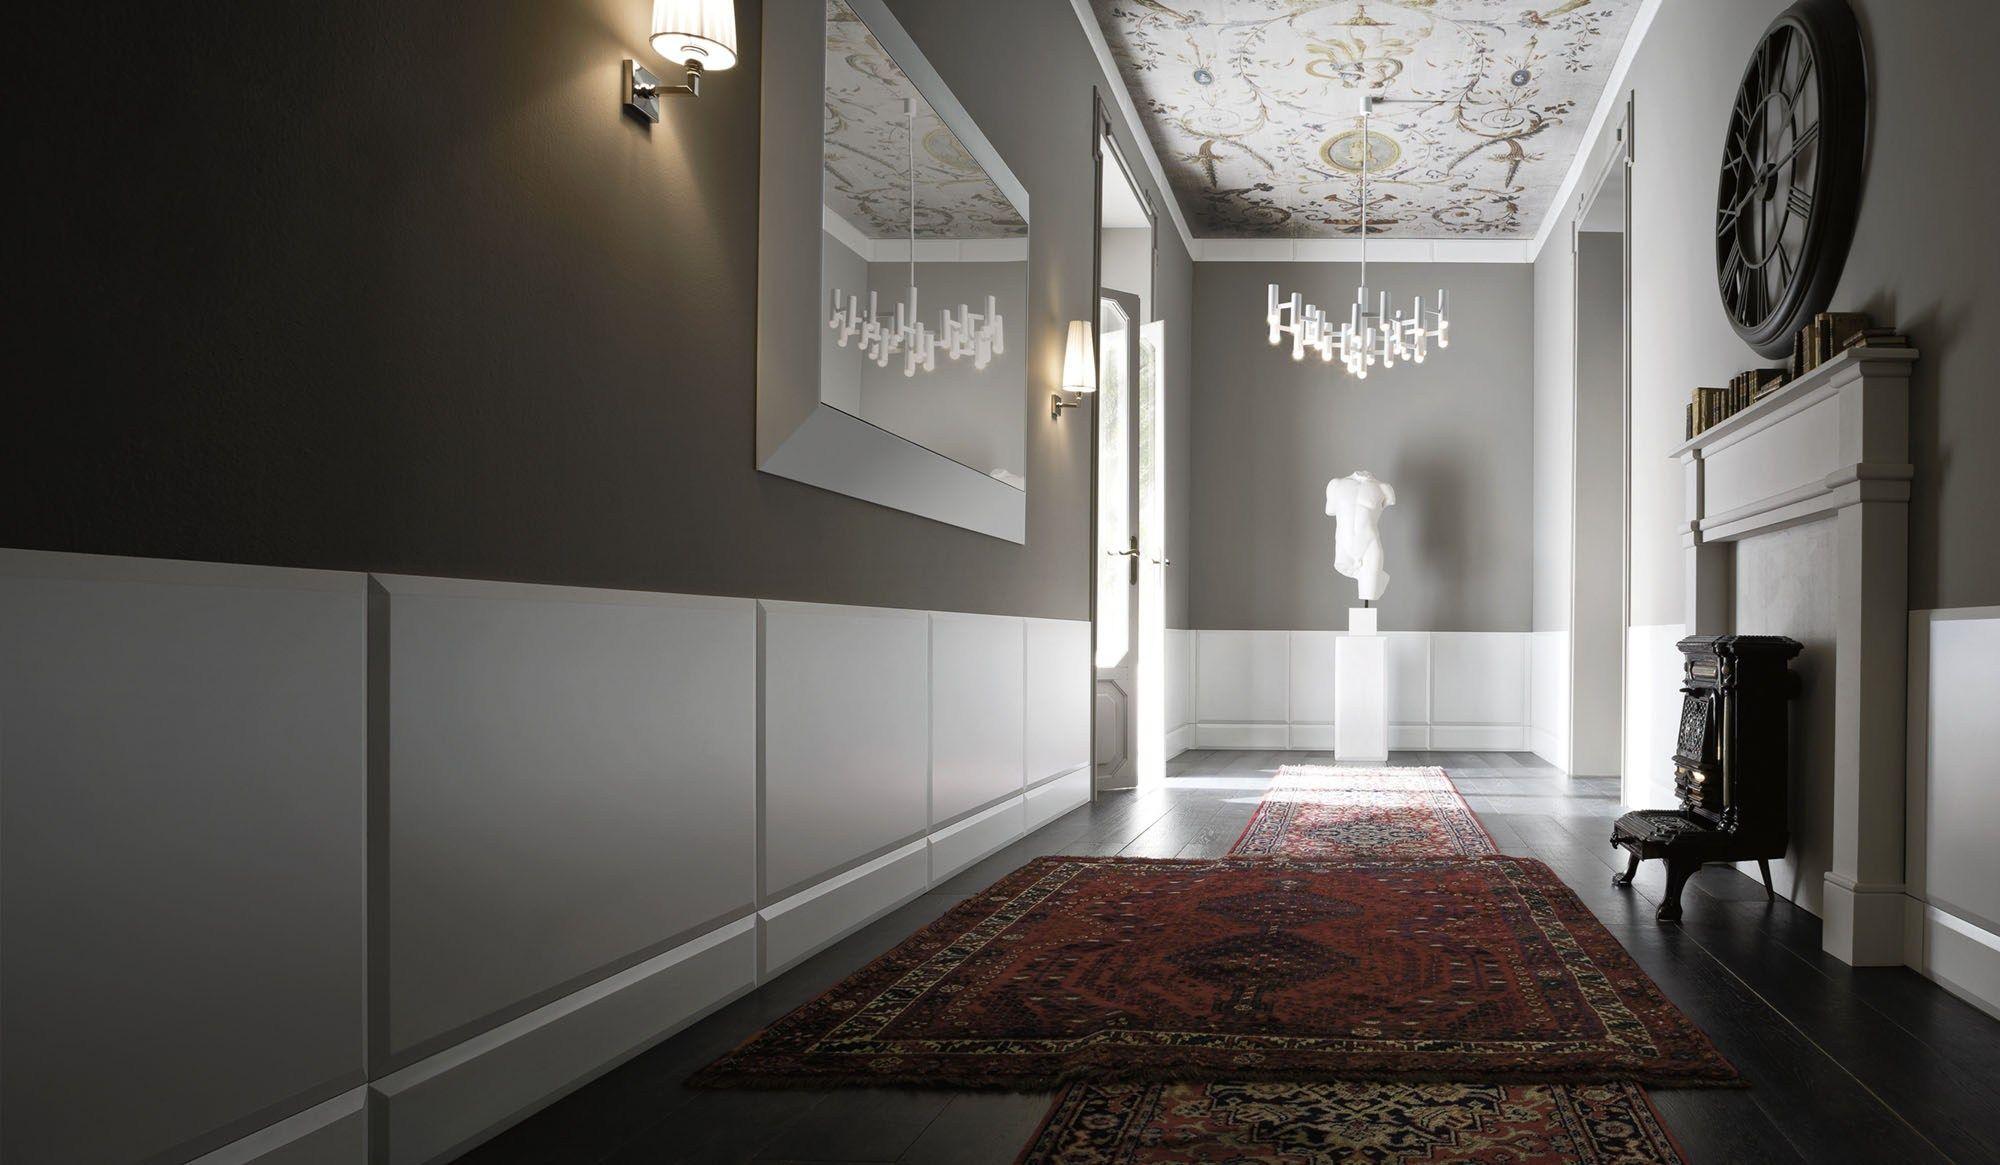 Warp Rev Tement Mural By Rexa Design